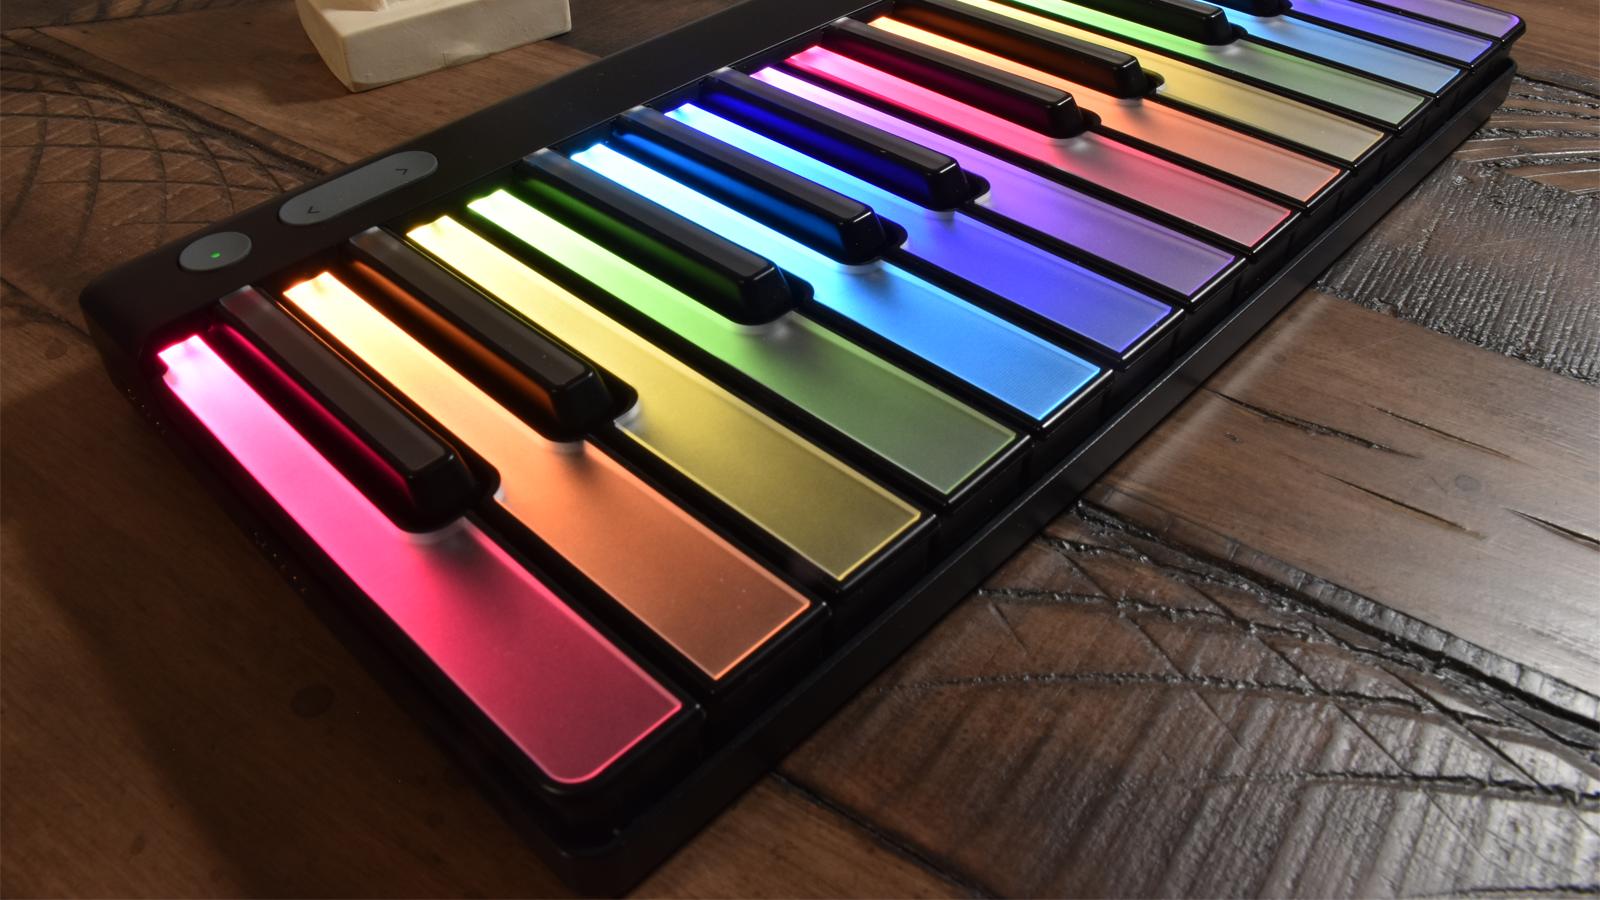 LUMI Keys keyboard at an angle on wooden table